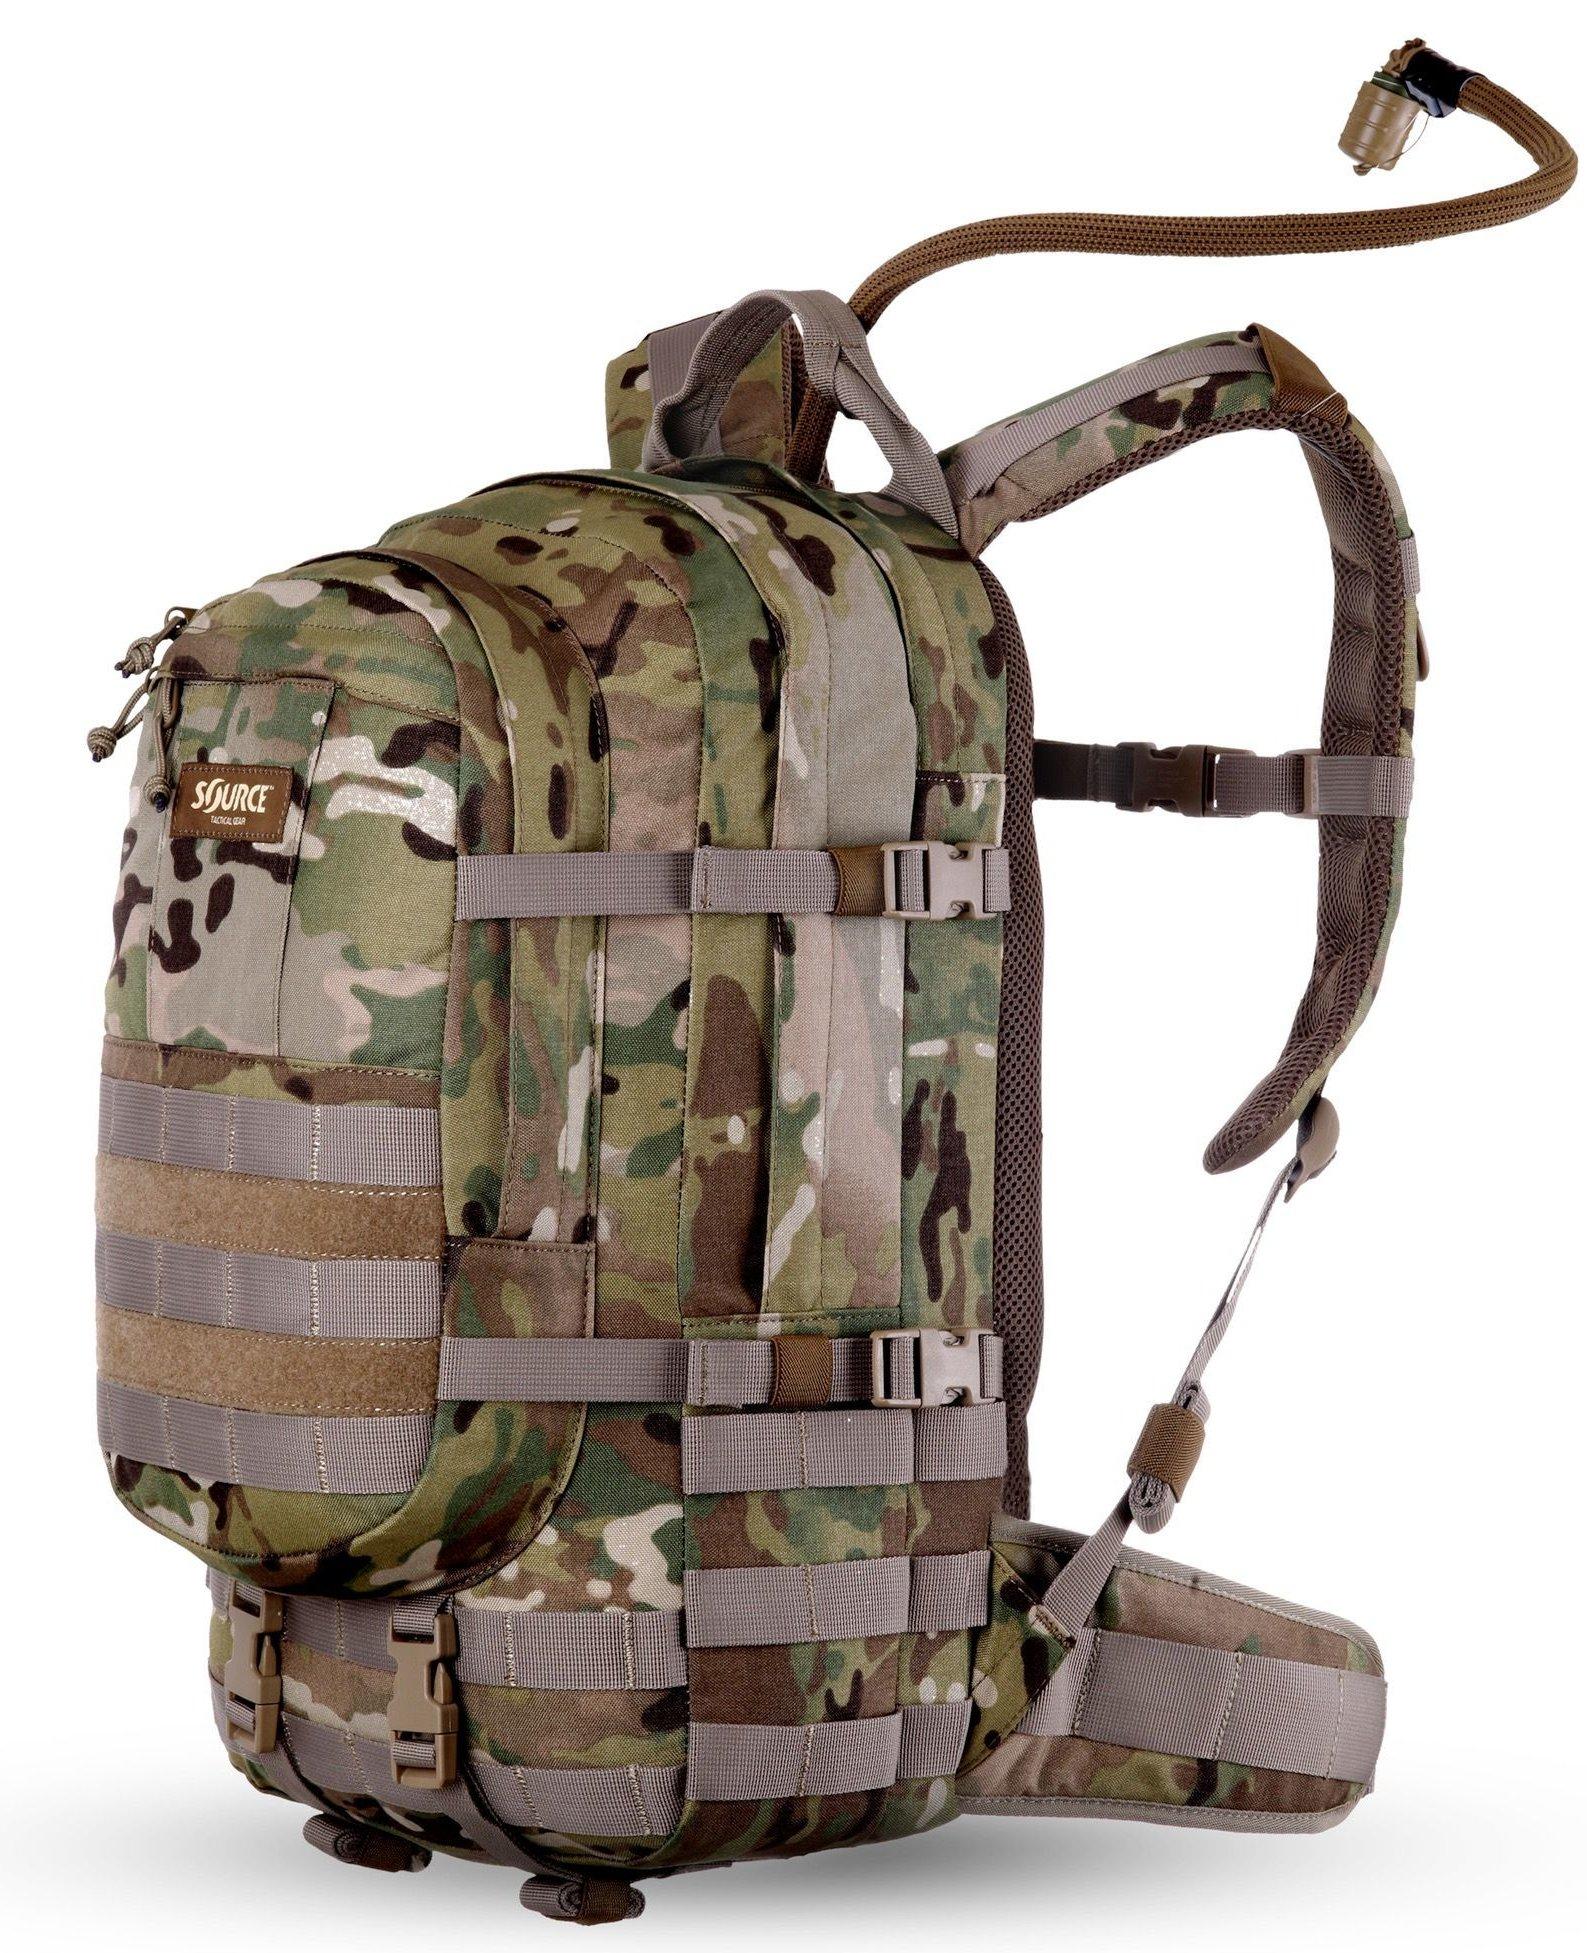 Source 20L Assault pack in Multicam